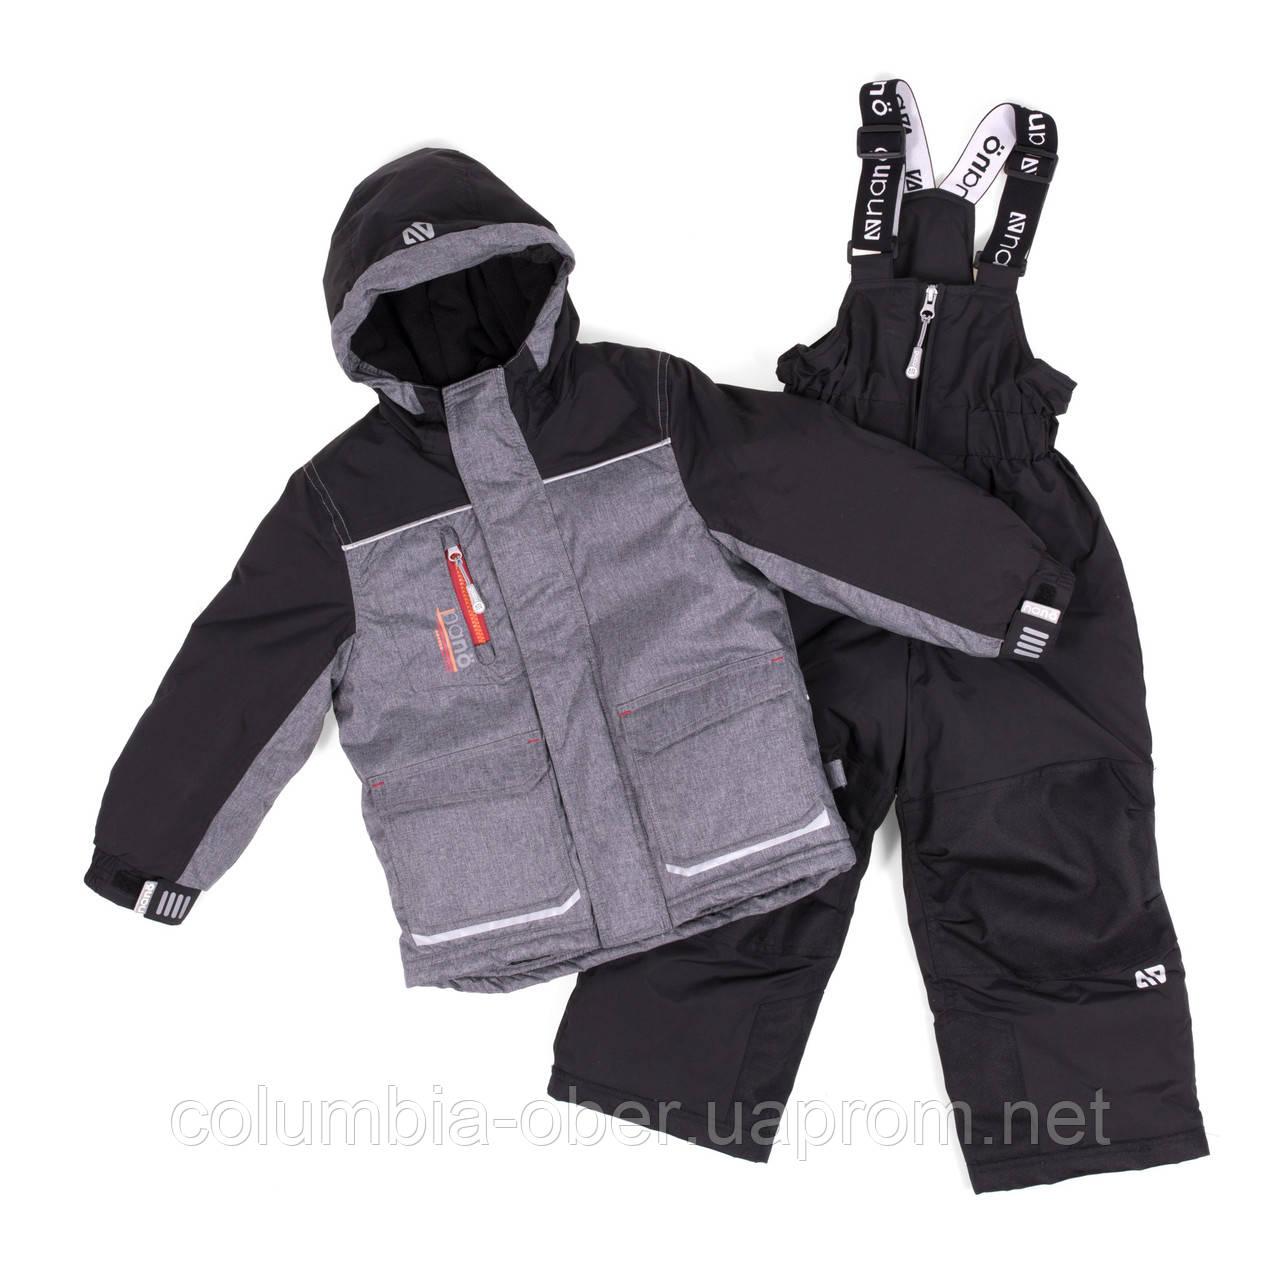 Зимний комплект для мальчика NANO F18 M 291 Black. Размеры 4-12.